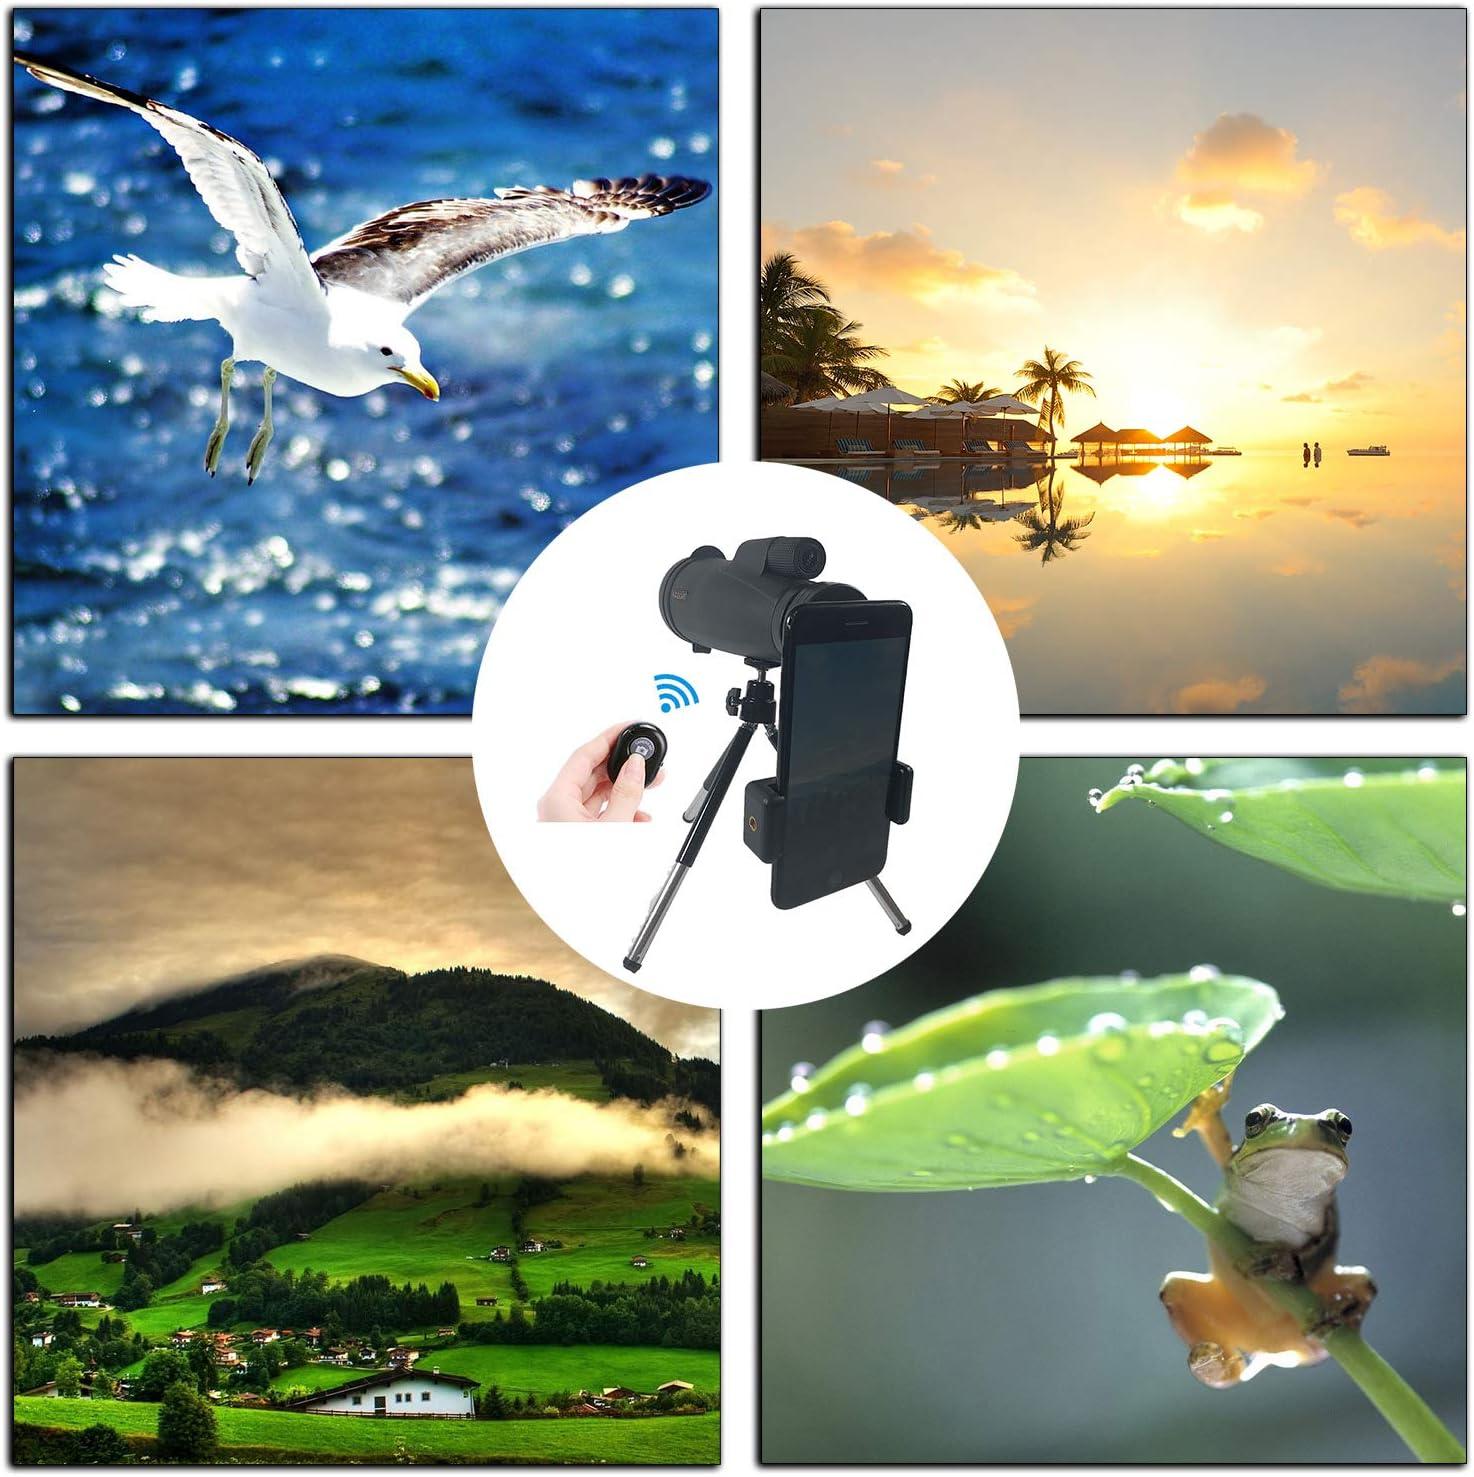 Monocular Telescope,12/×50High Power /& HD Monocular with Phone Mount /& Tripod.Hand Focus,Waterproof Shockproof,High Definition Bak4 Prism Fmc Monocular for Bird Watching,Hunting,Camping,Hiking,Outdoor